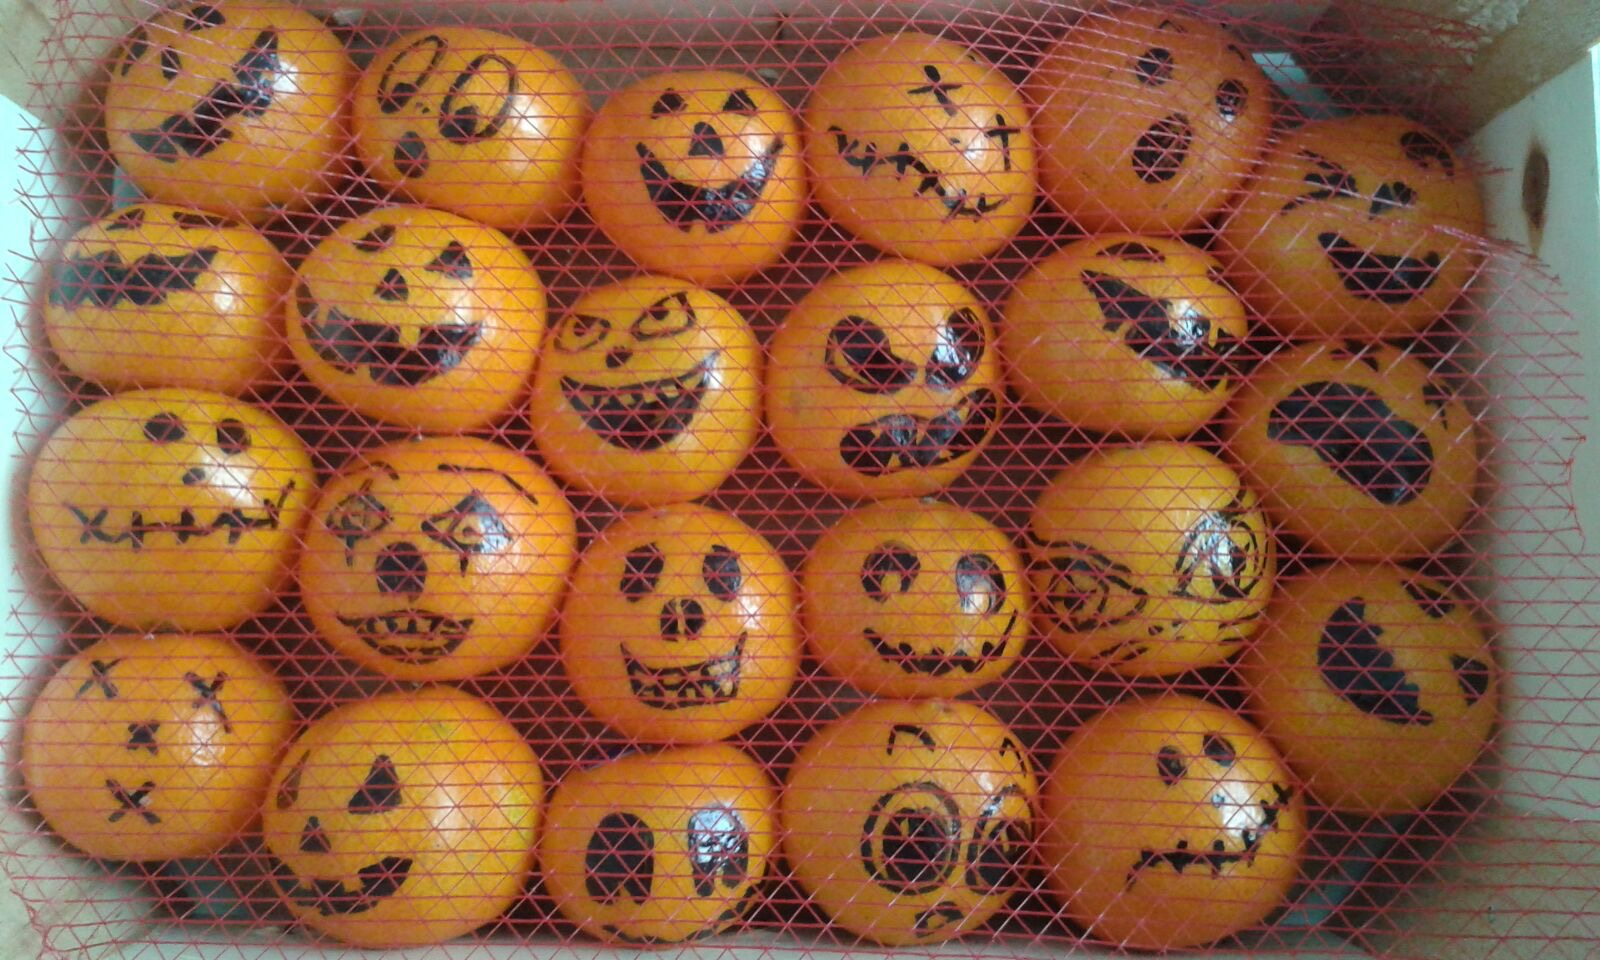 st 1 - Halloweenduik - Noord Aa Zoetermeer